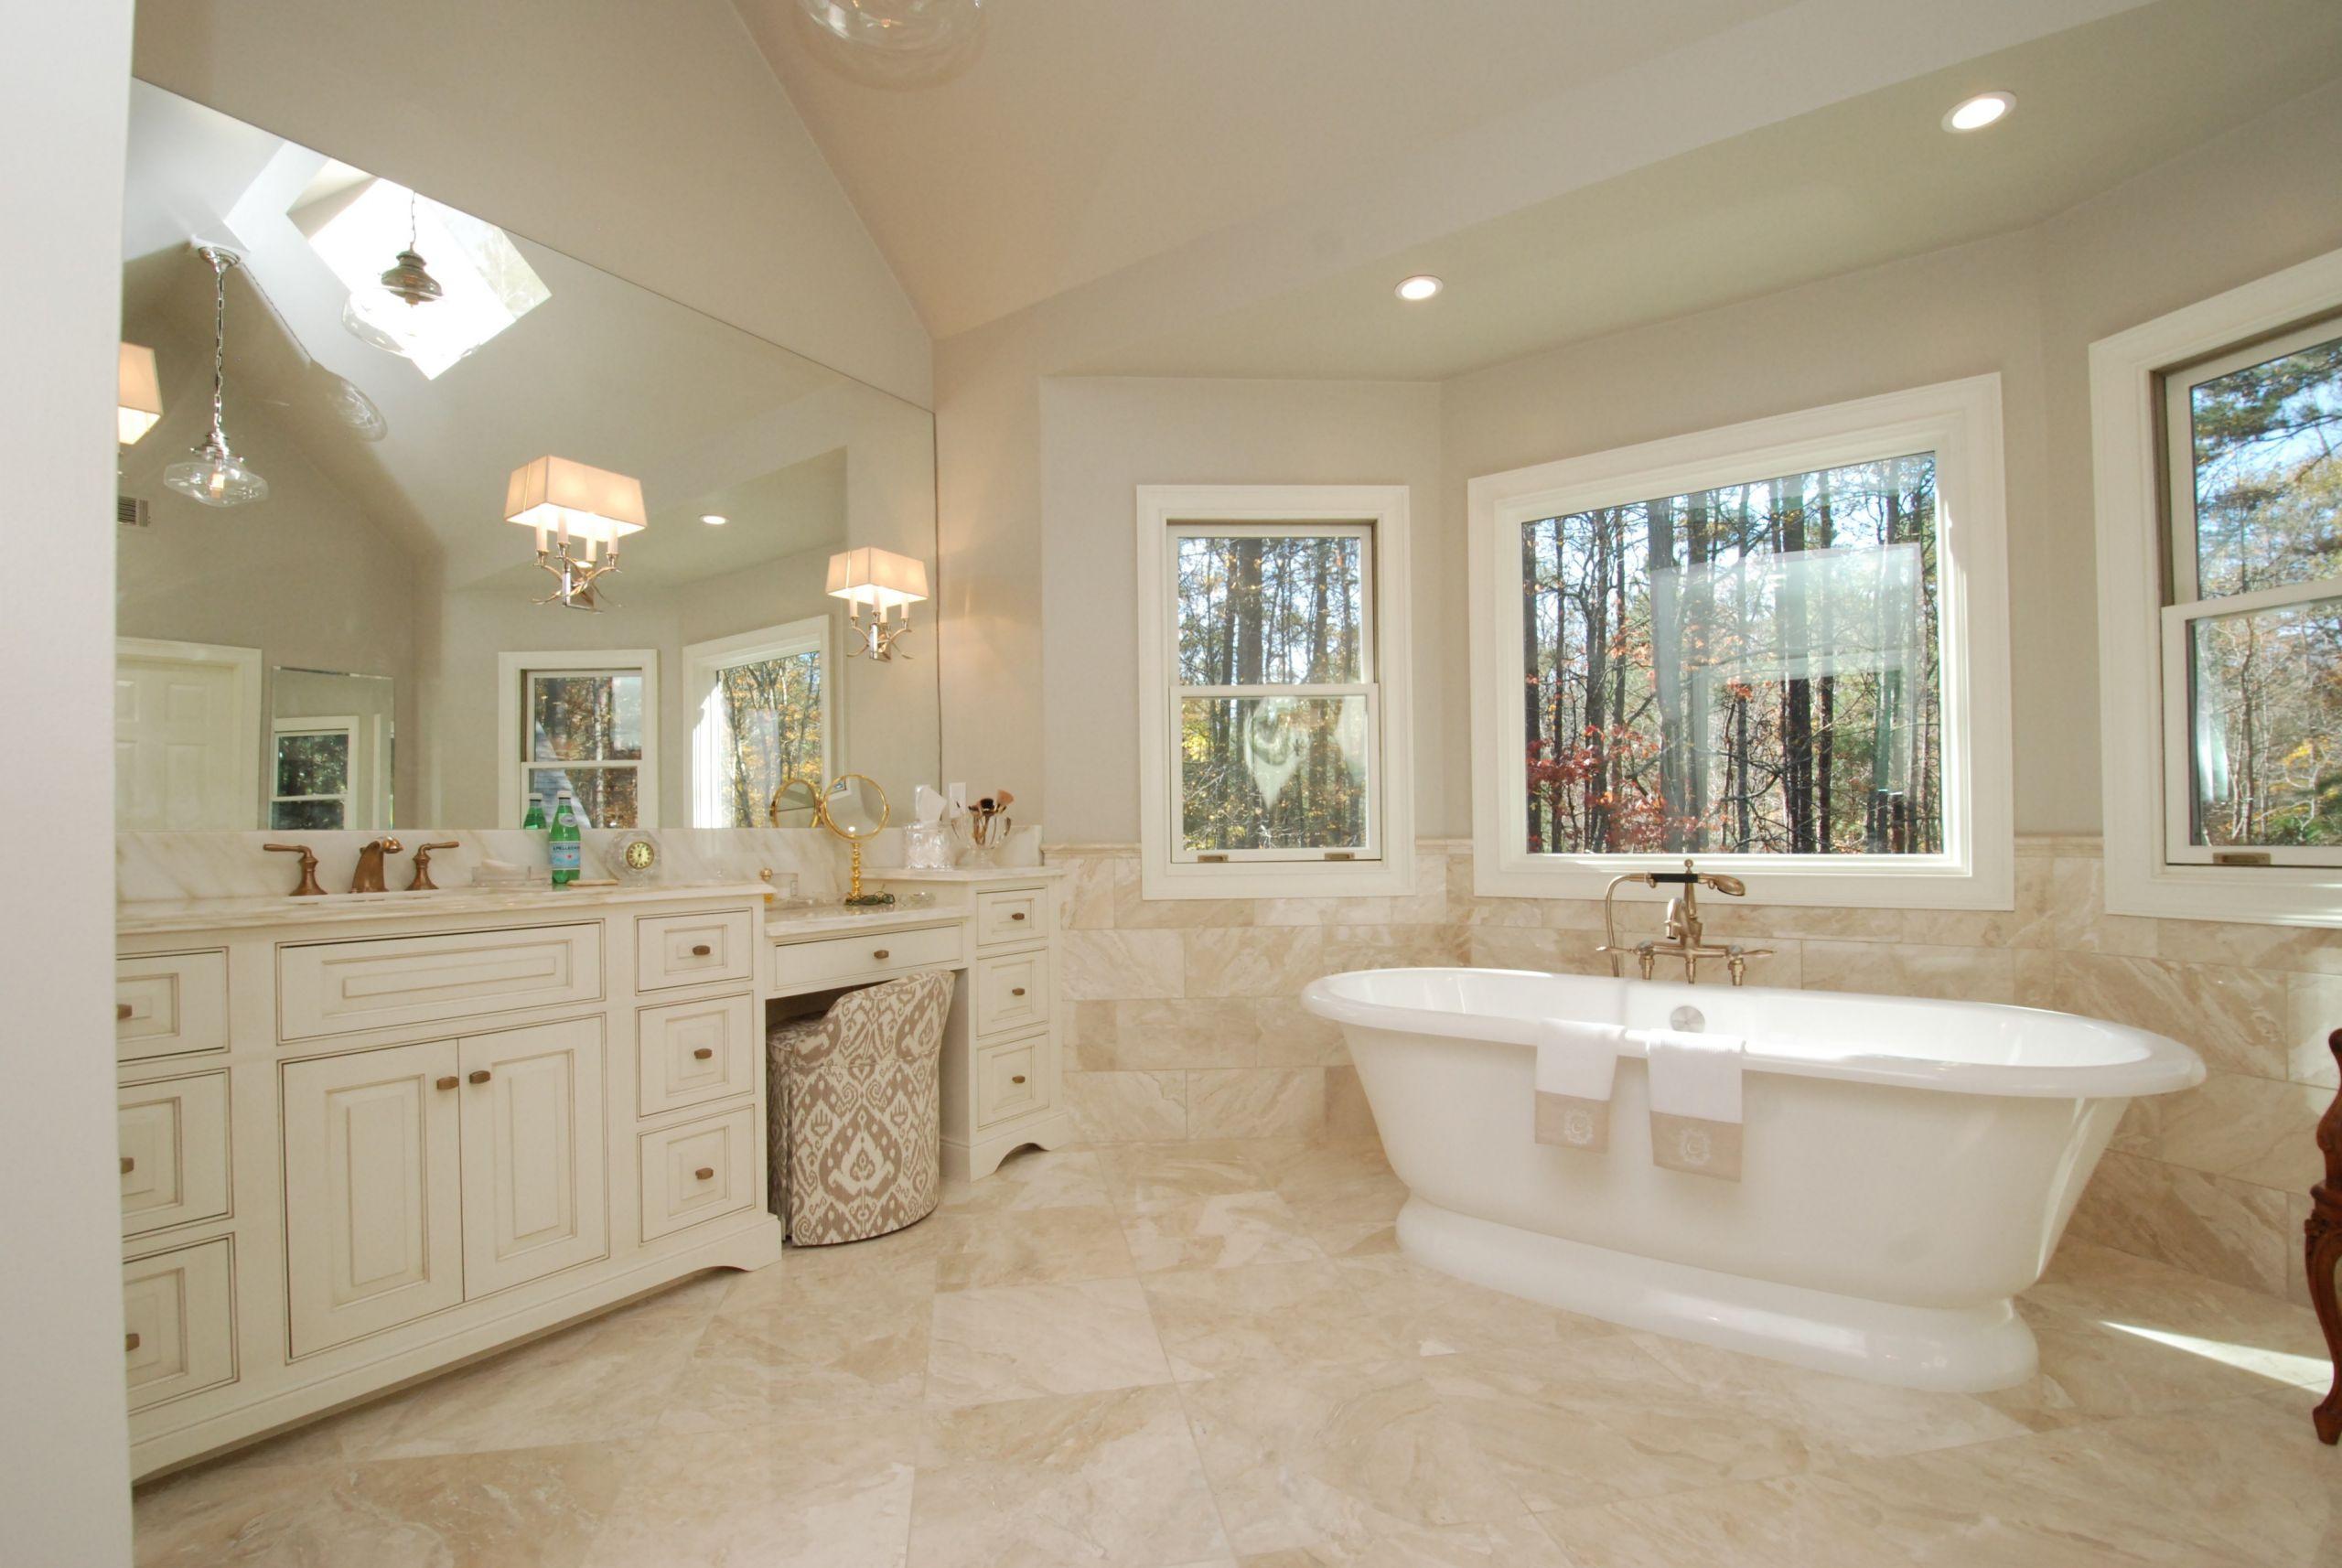 Master Bathroom Ideas Photo Gallery  Luxury Elegant Master Bathrooms Portrait Home Sweet Home